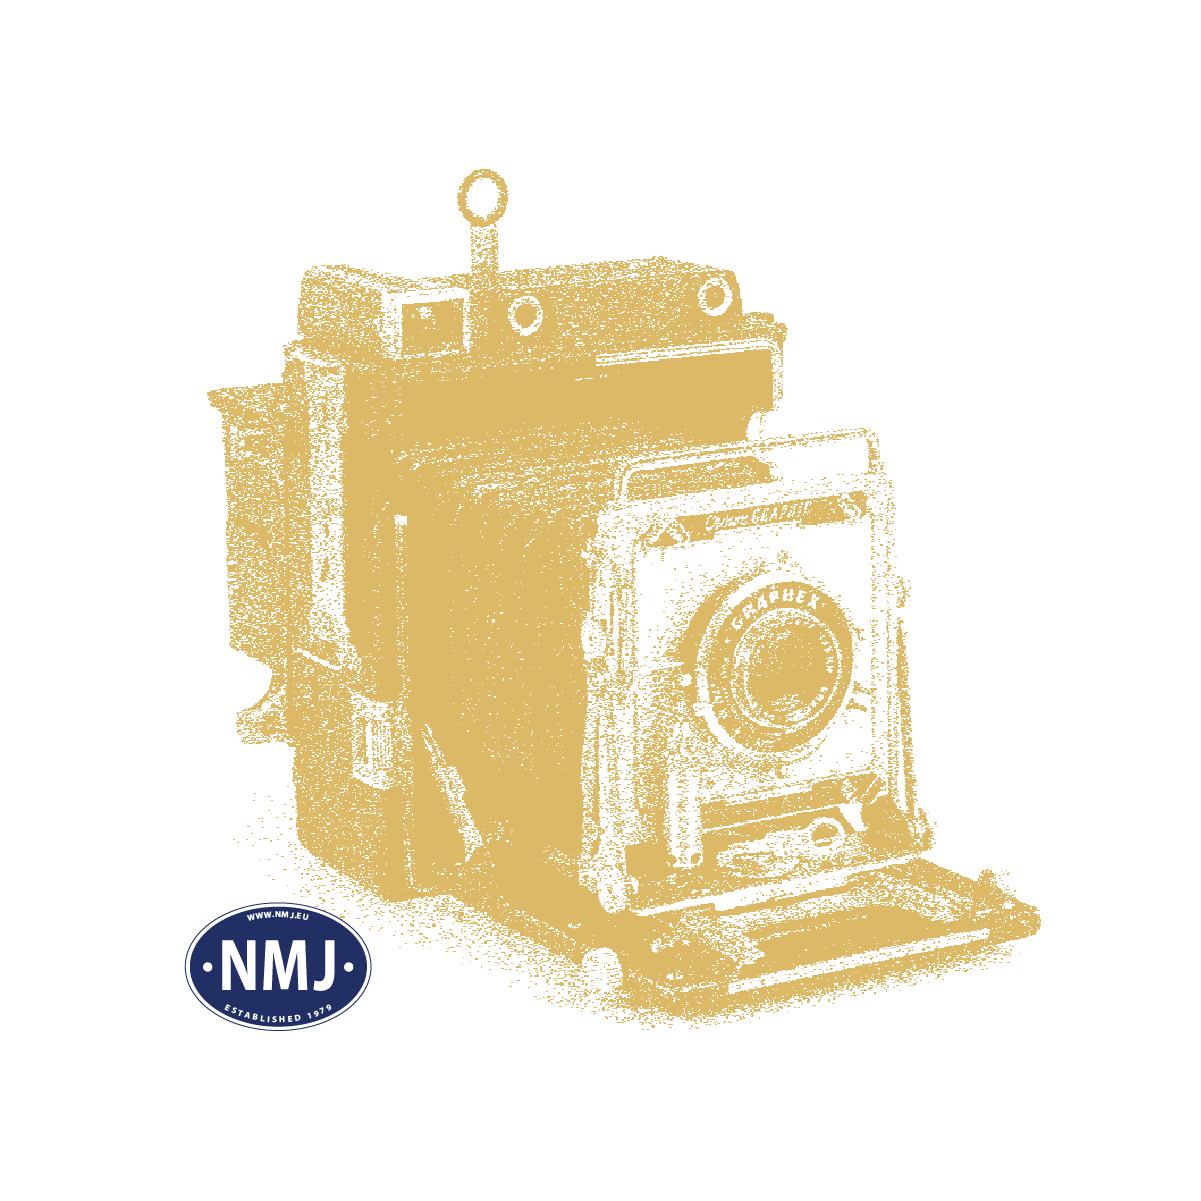 NMJH15126 - Kråkstad Dressinskur, Ferdigmodell